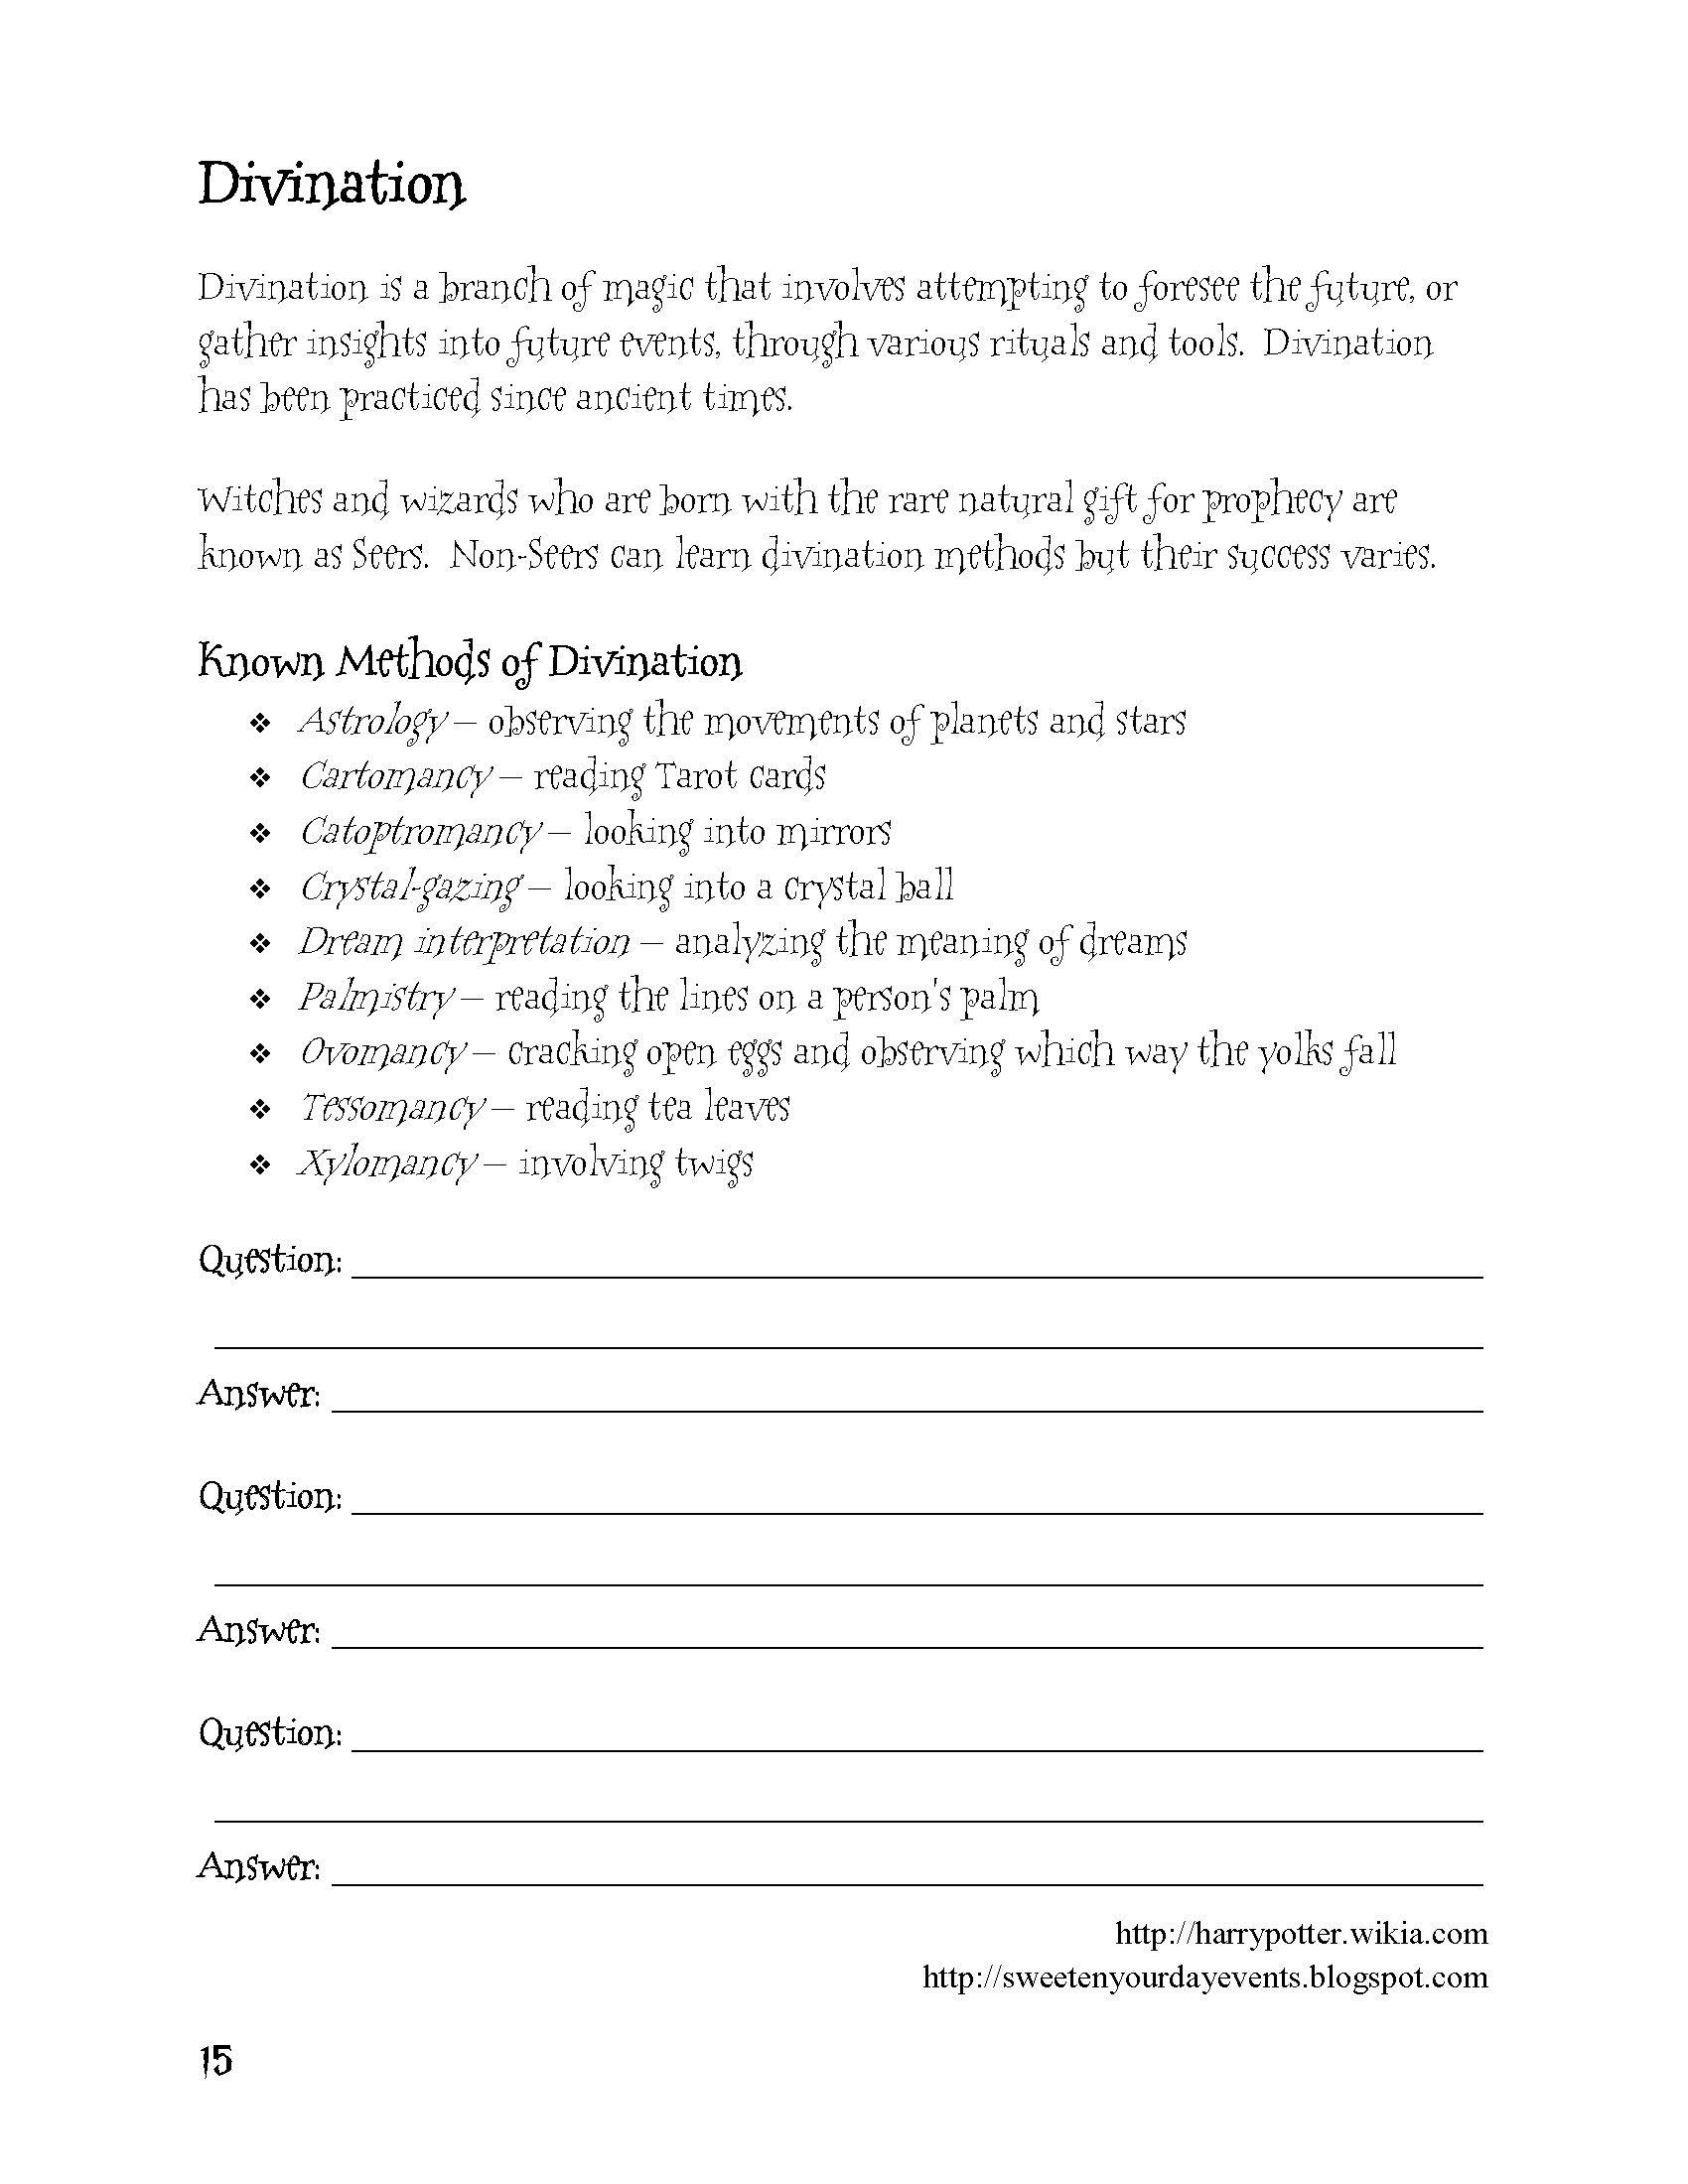 Harry Potter Student Activity Book Divination Magic School Homeschool Language Arts Education Inspiration [ 2200 x 1700 Pixel ]